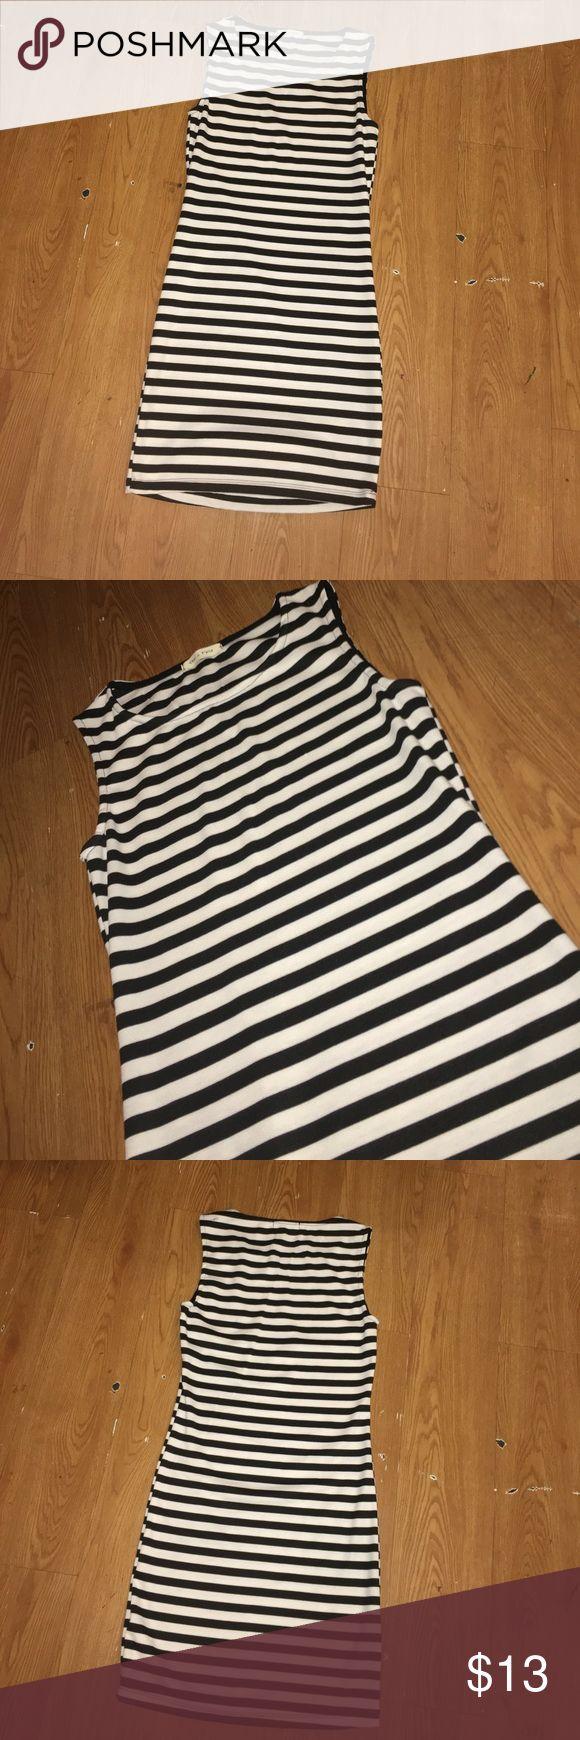 Black and White Striped Bodycon Dress black and white striped Bodycon dress Tea n Rose Dresses Mini